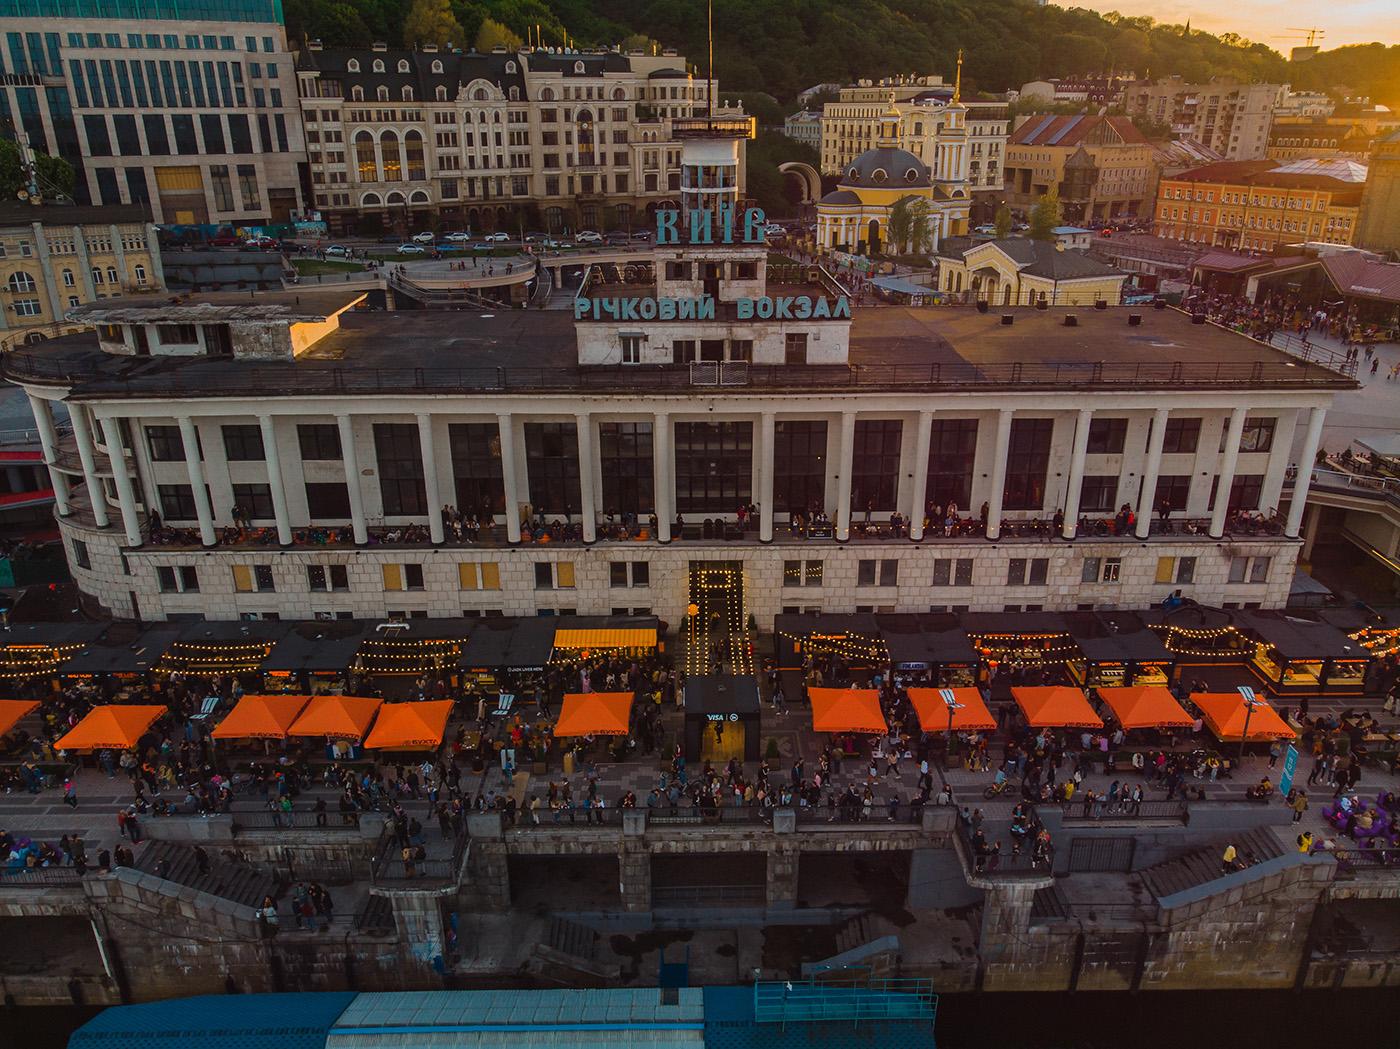 🐟 Jak «BUHTA food station» vidkryvaje strit-fud novynky. Istorija «Odeśkogo pryvozu»